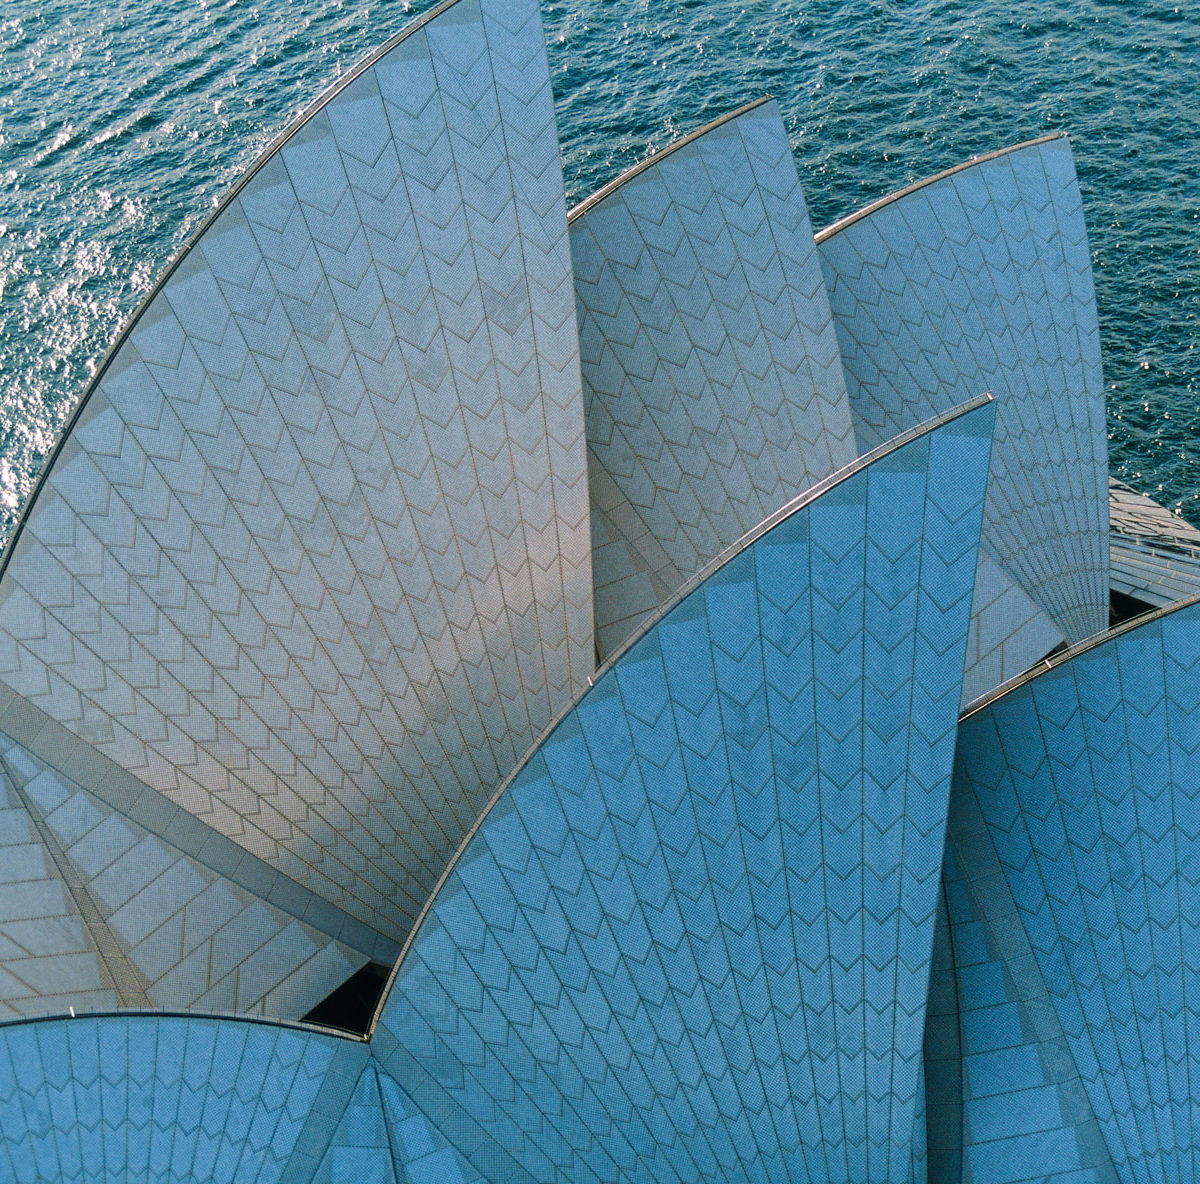 Sydney Opera house - New South Wales - Australia (33° 51' S – 151° 12' E)